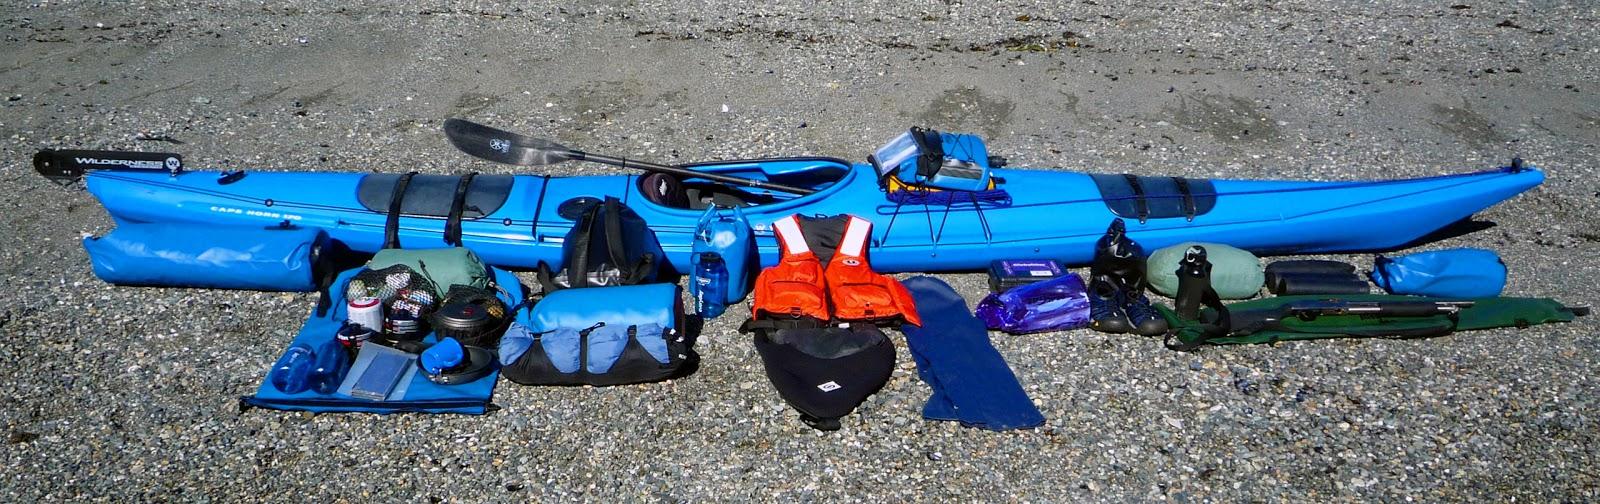 Northwest explorer kayak gear list for Kayak fishing gear list